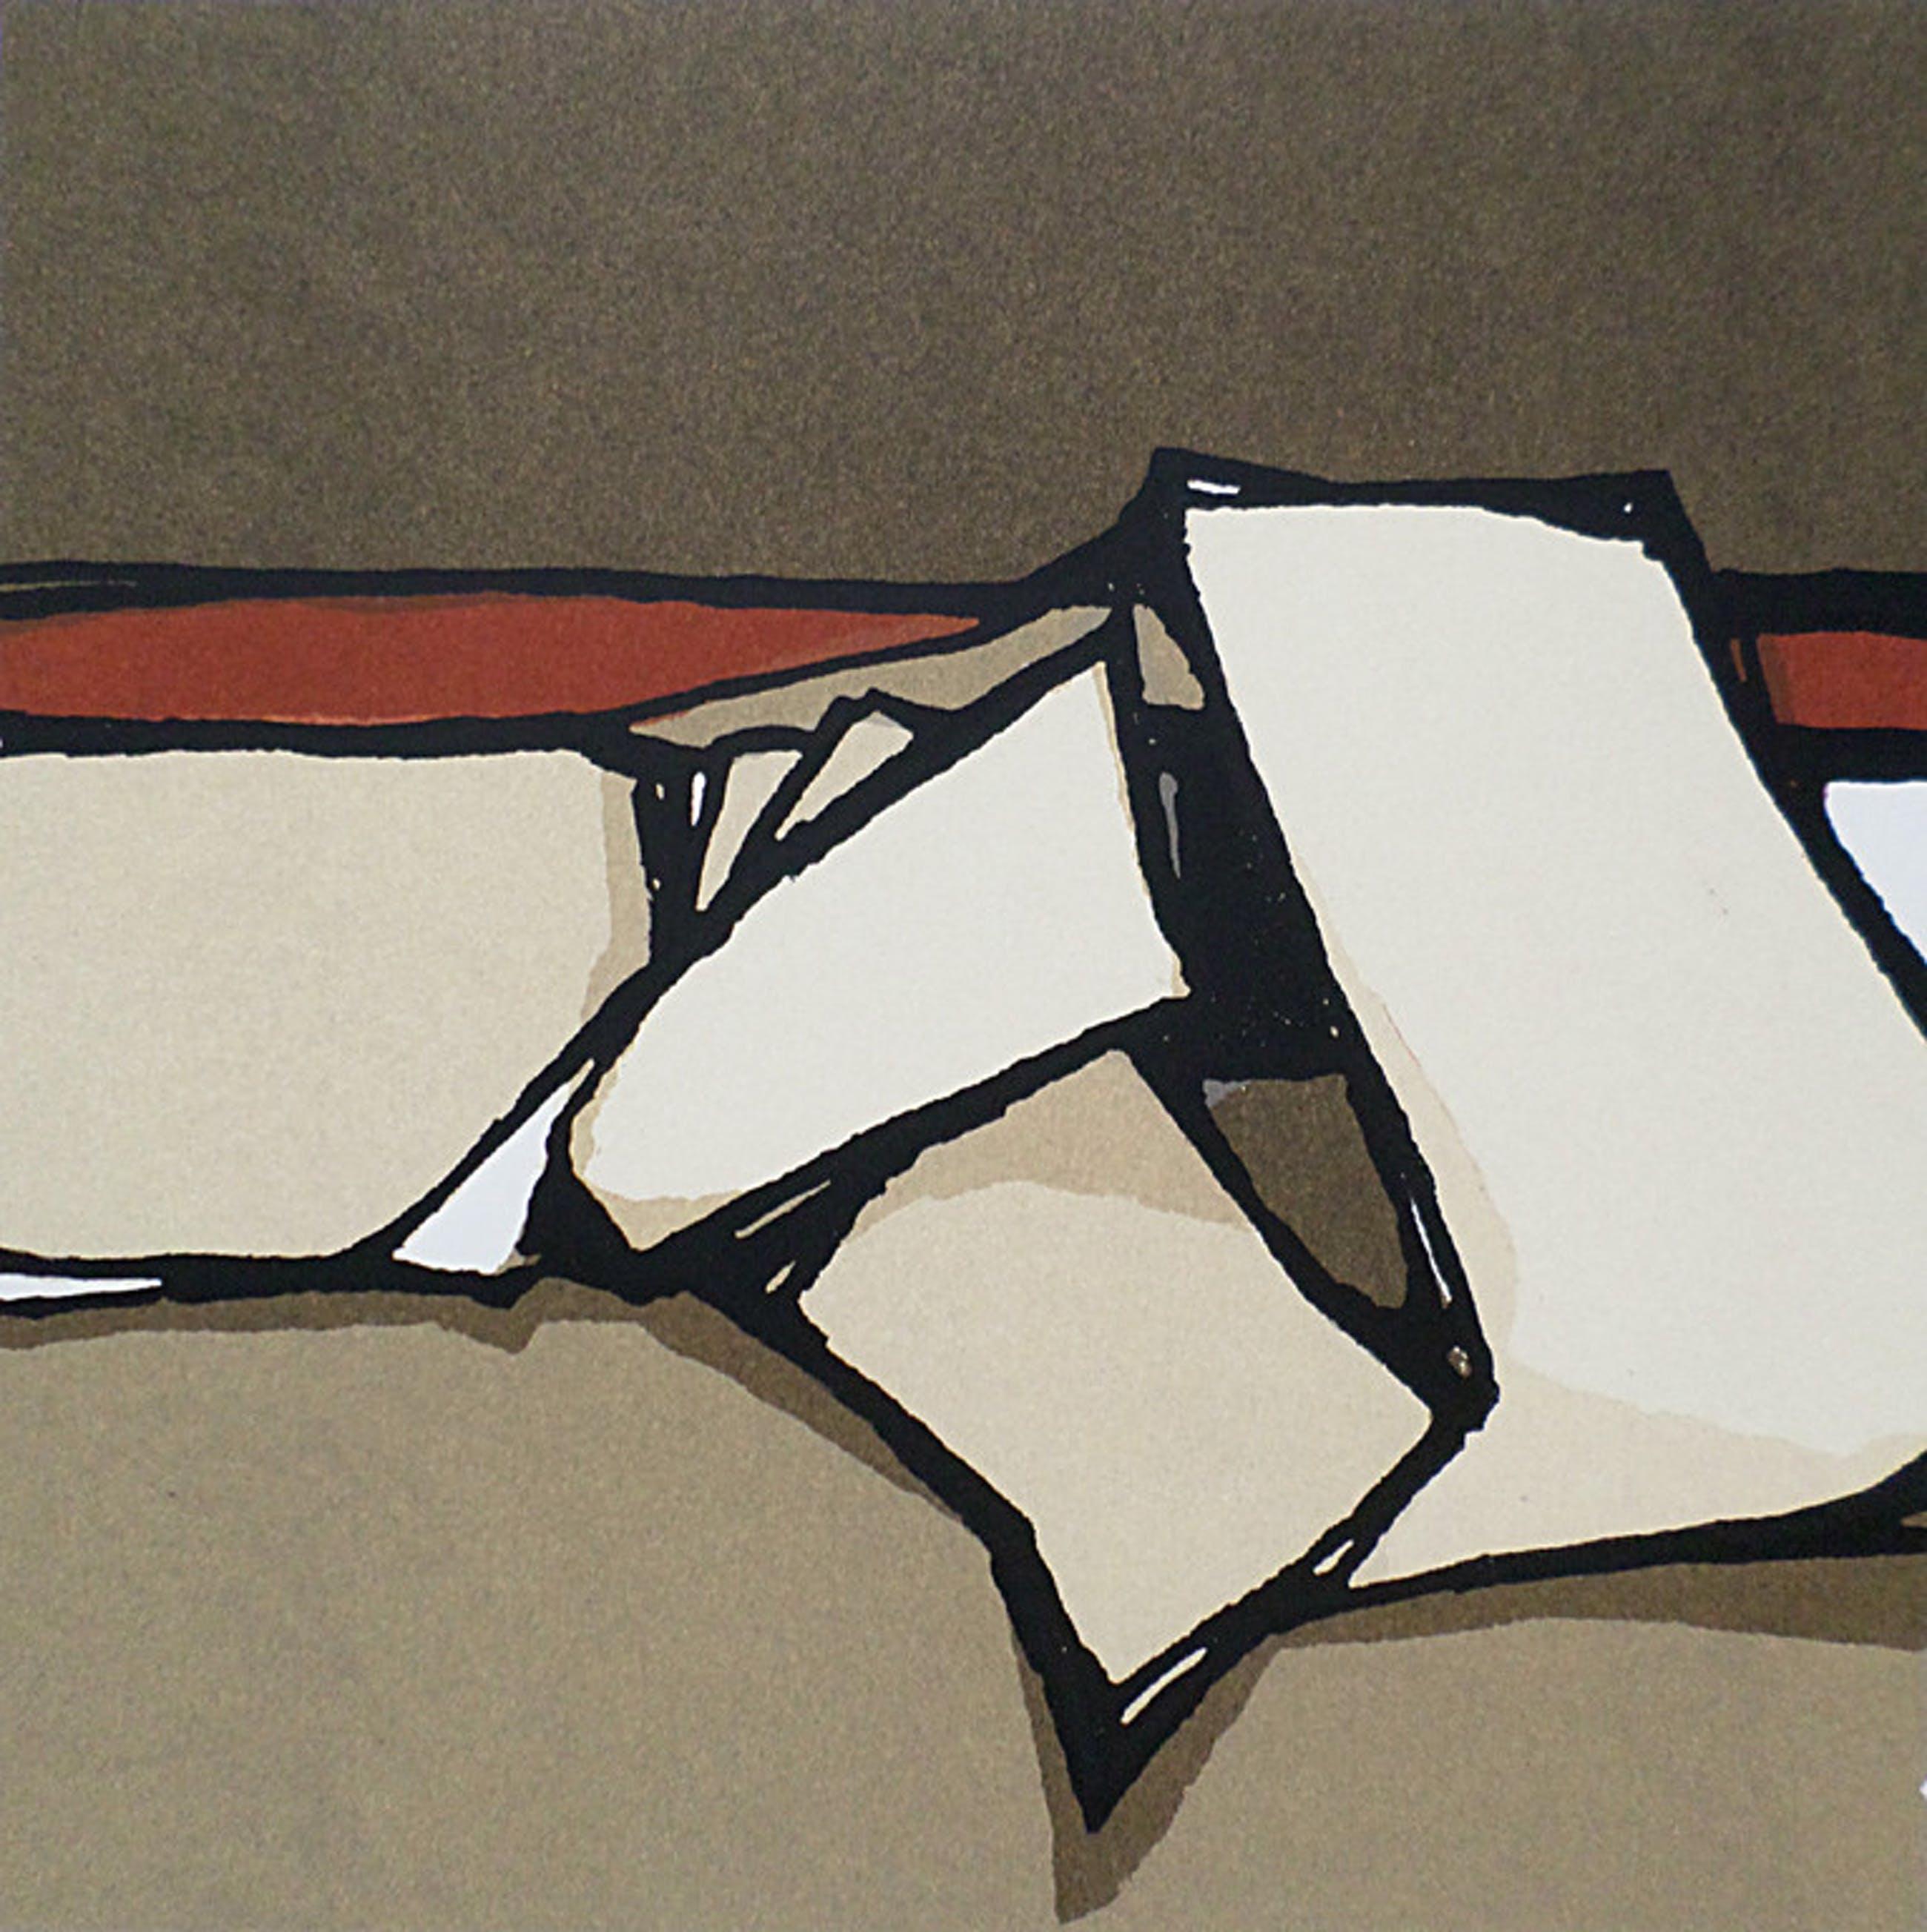 Fon Klement - Paysage, hoogdruk boardsnede kopen? Bied vanaf 175!